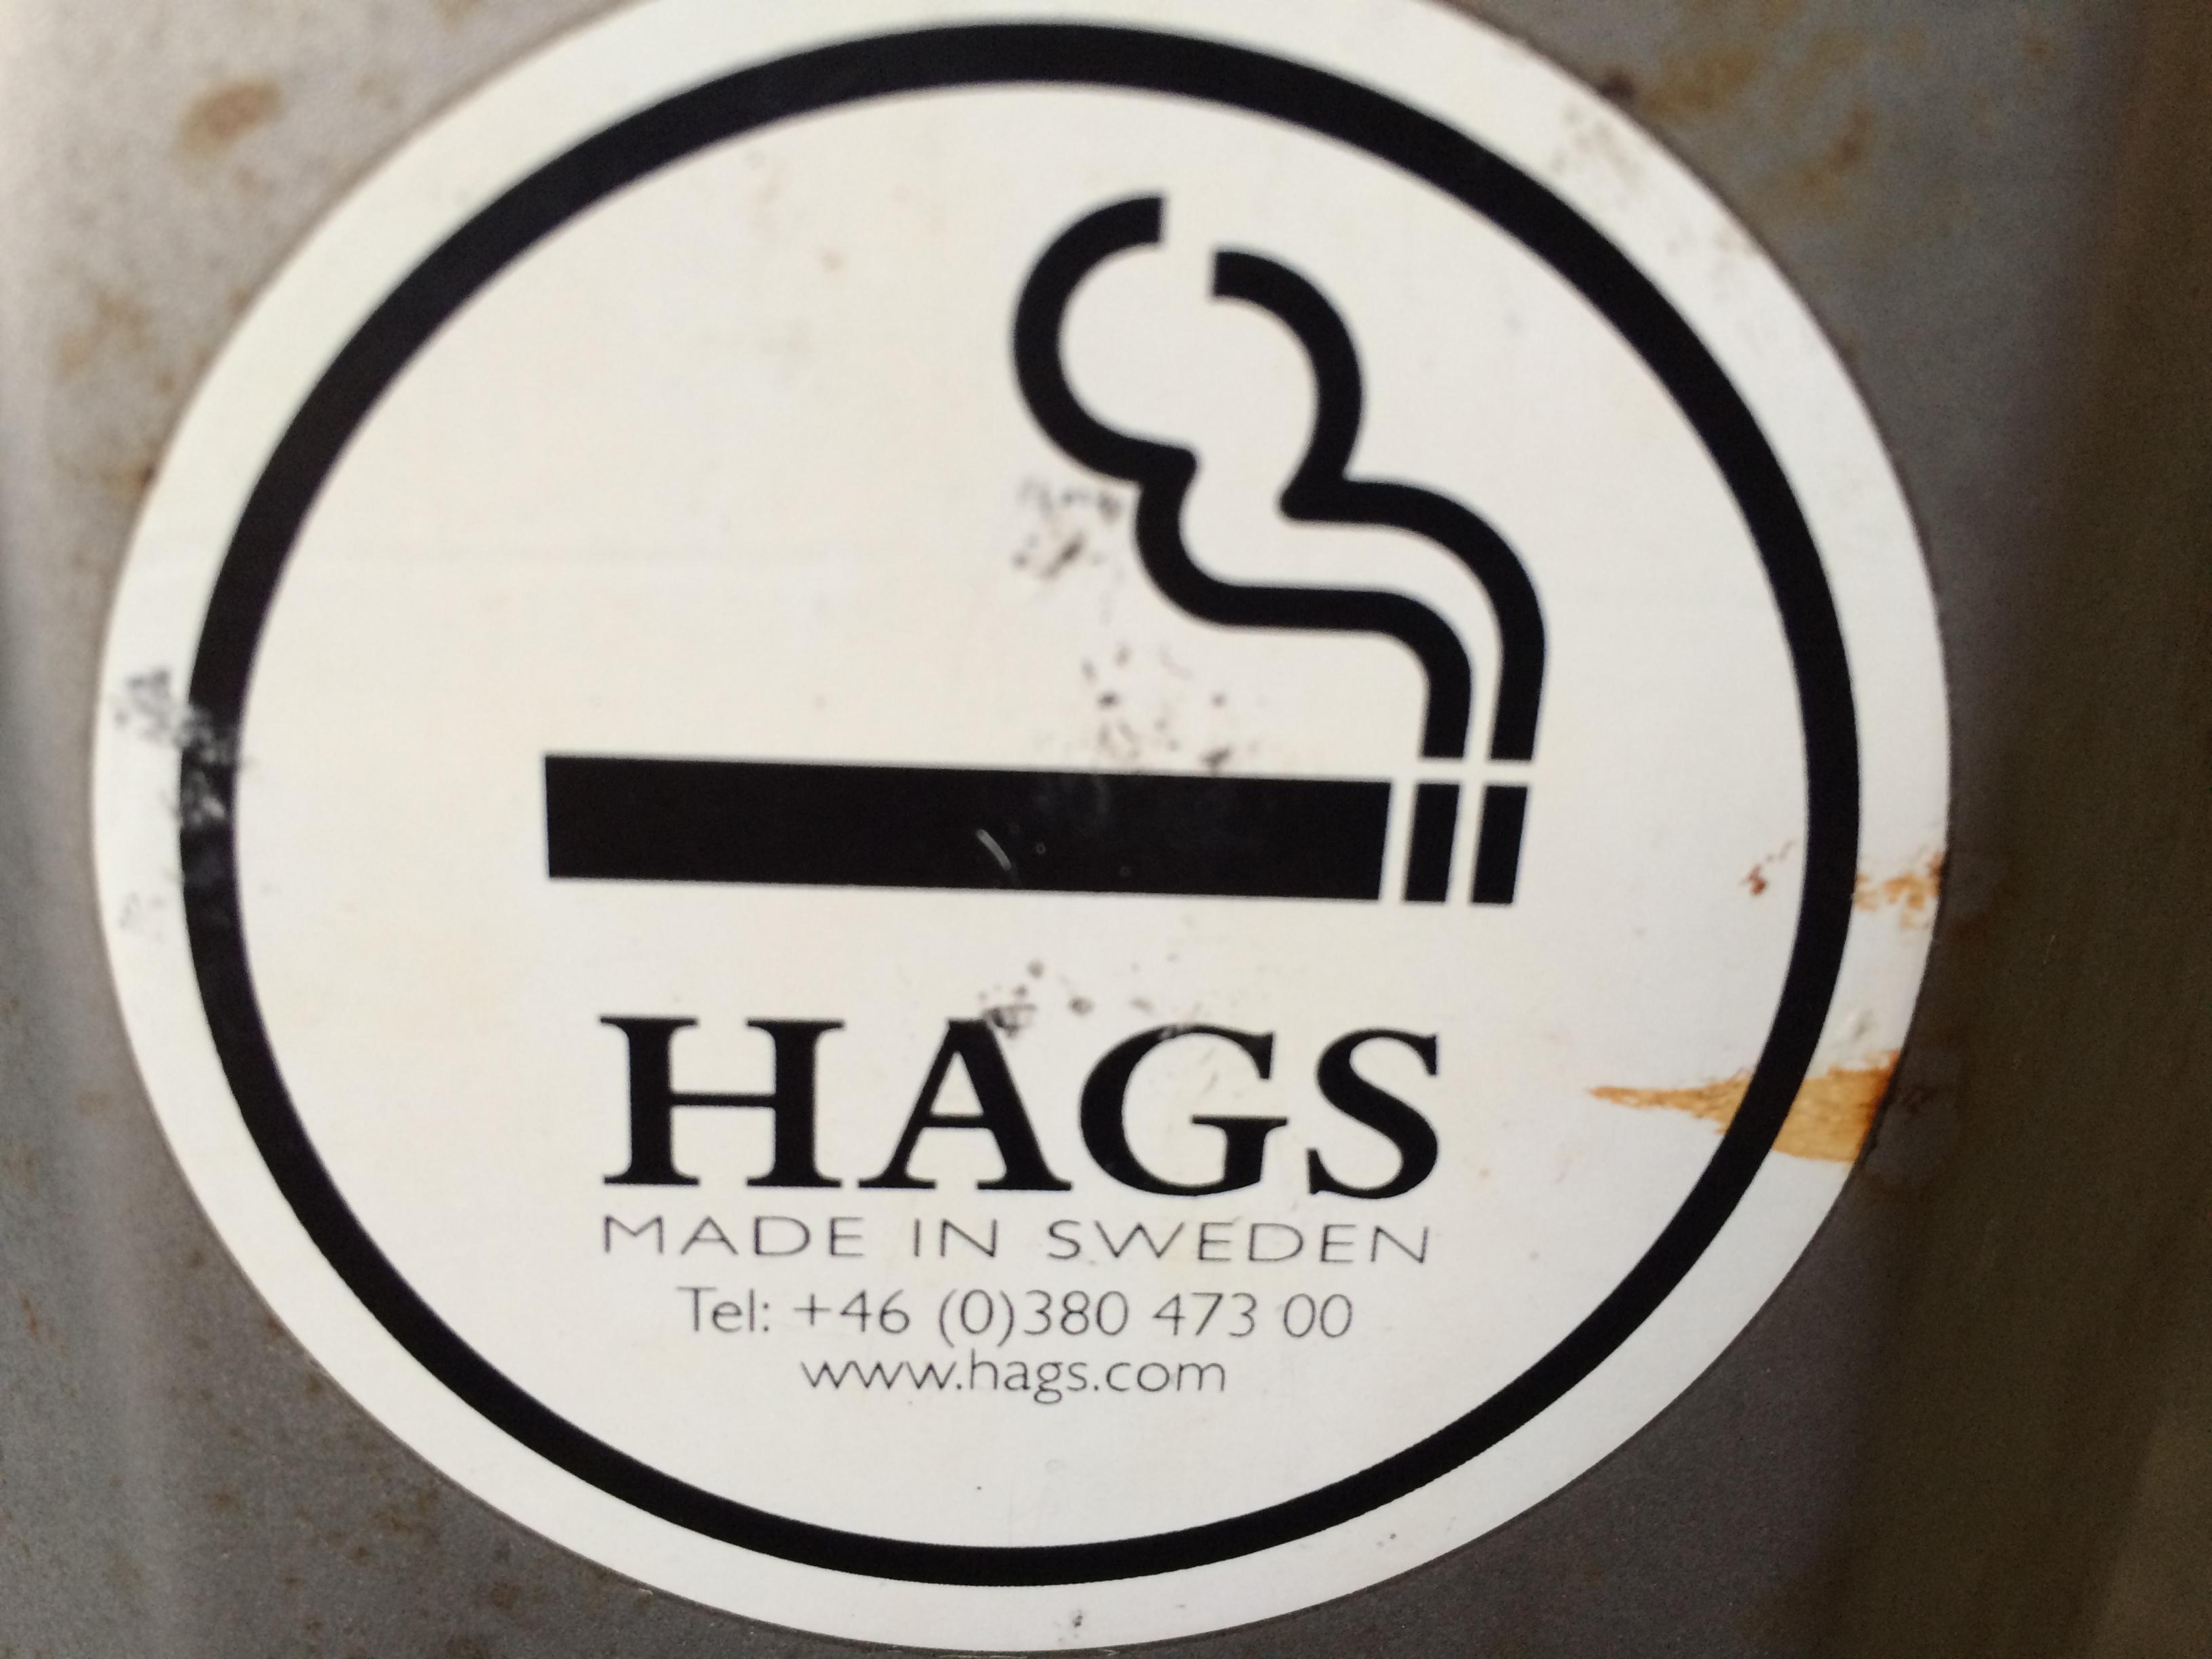 Hags of Sweden